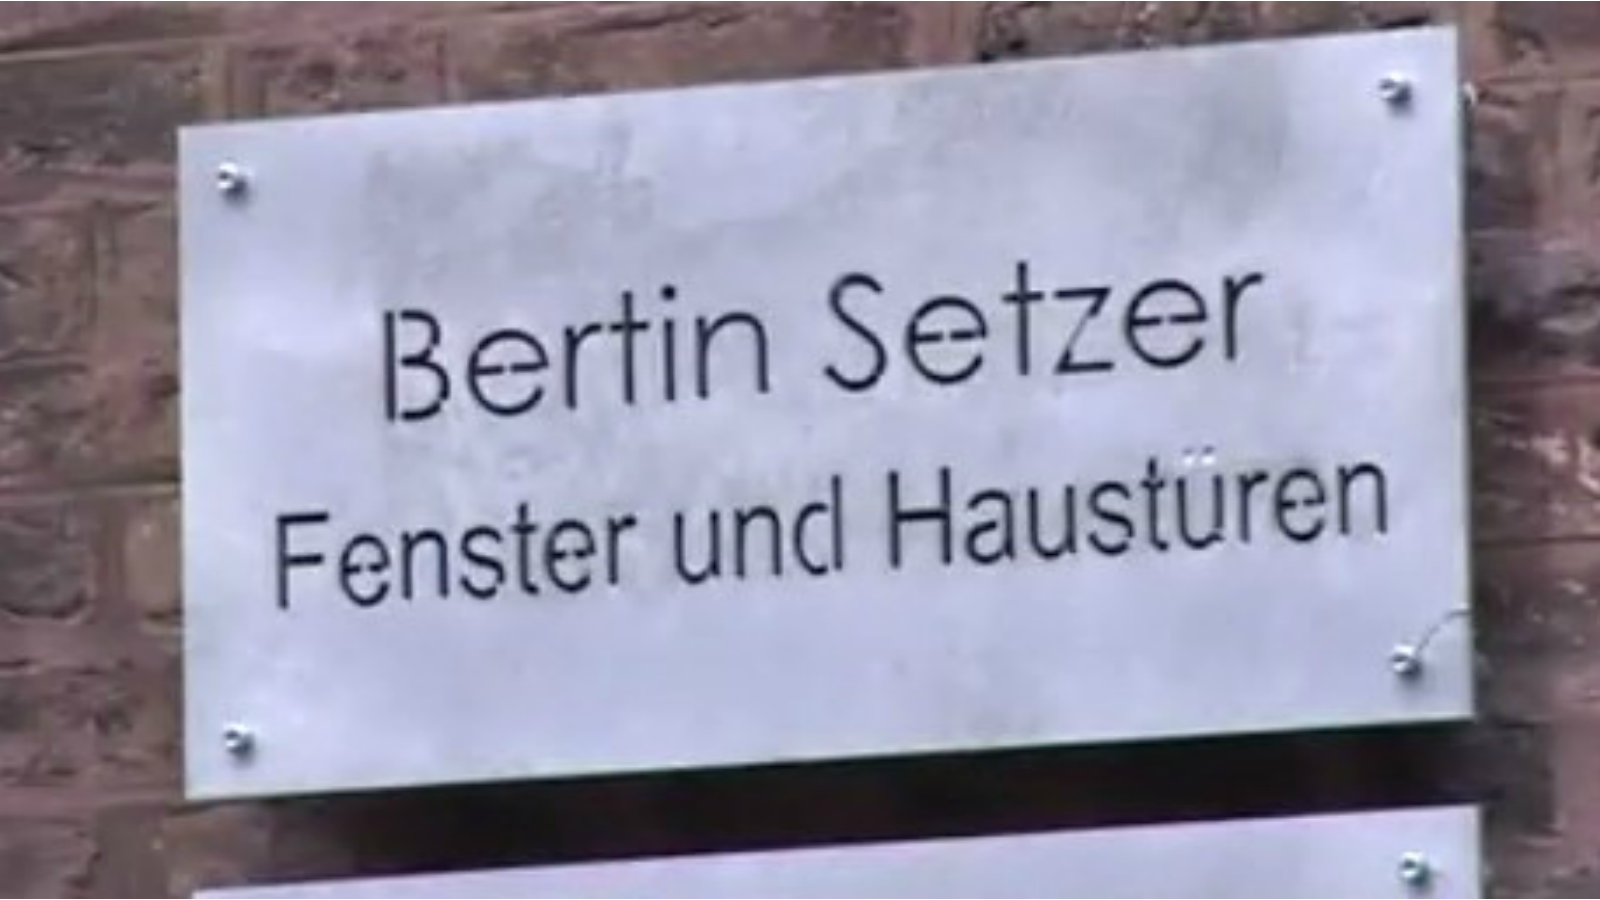 Bertin Setzer